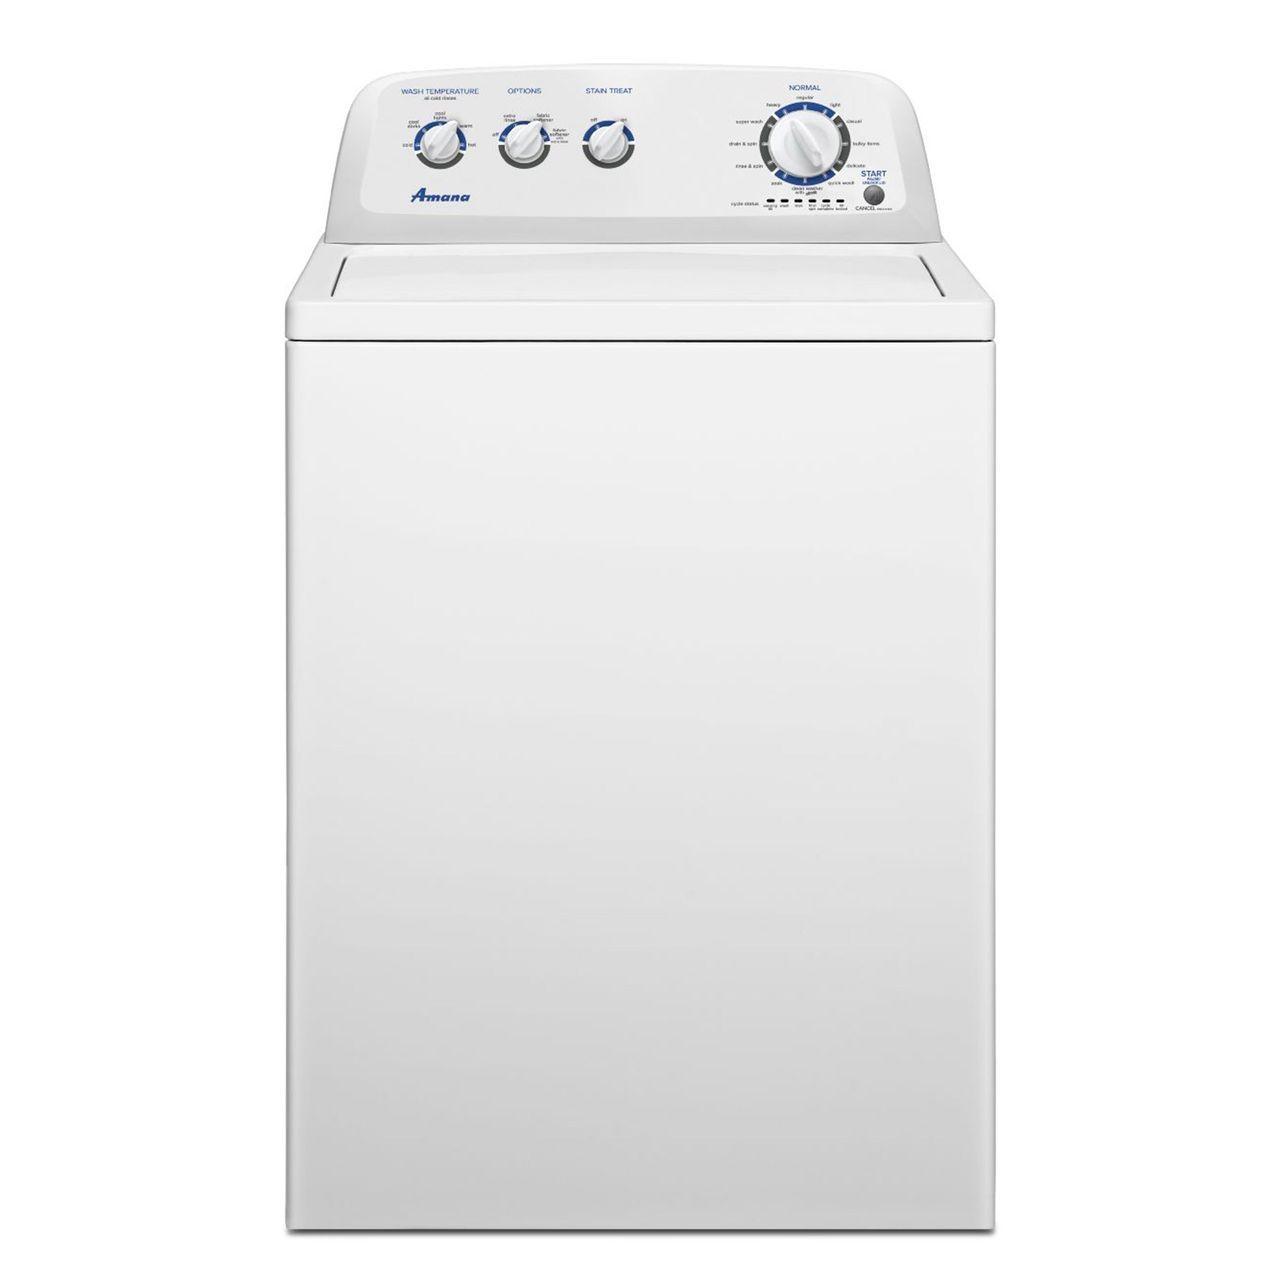 Amana 3 8 Cu Ft Washer Ntw4750bq Washer Washing Machine